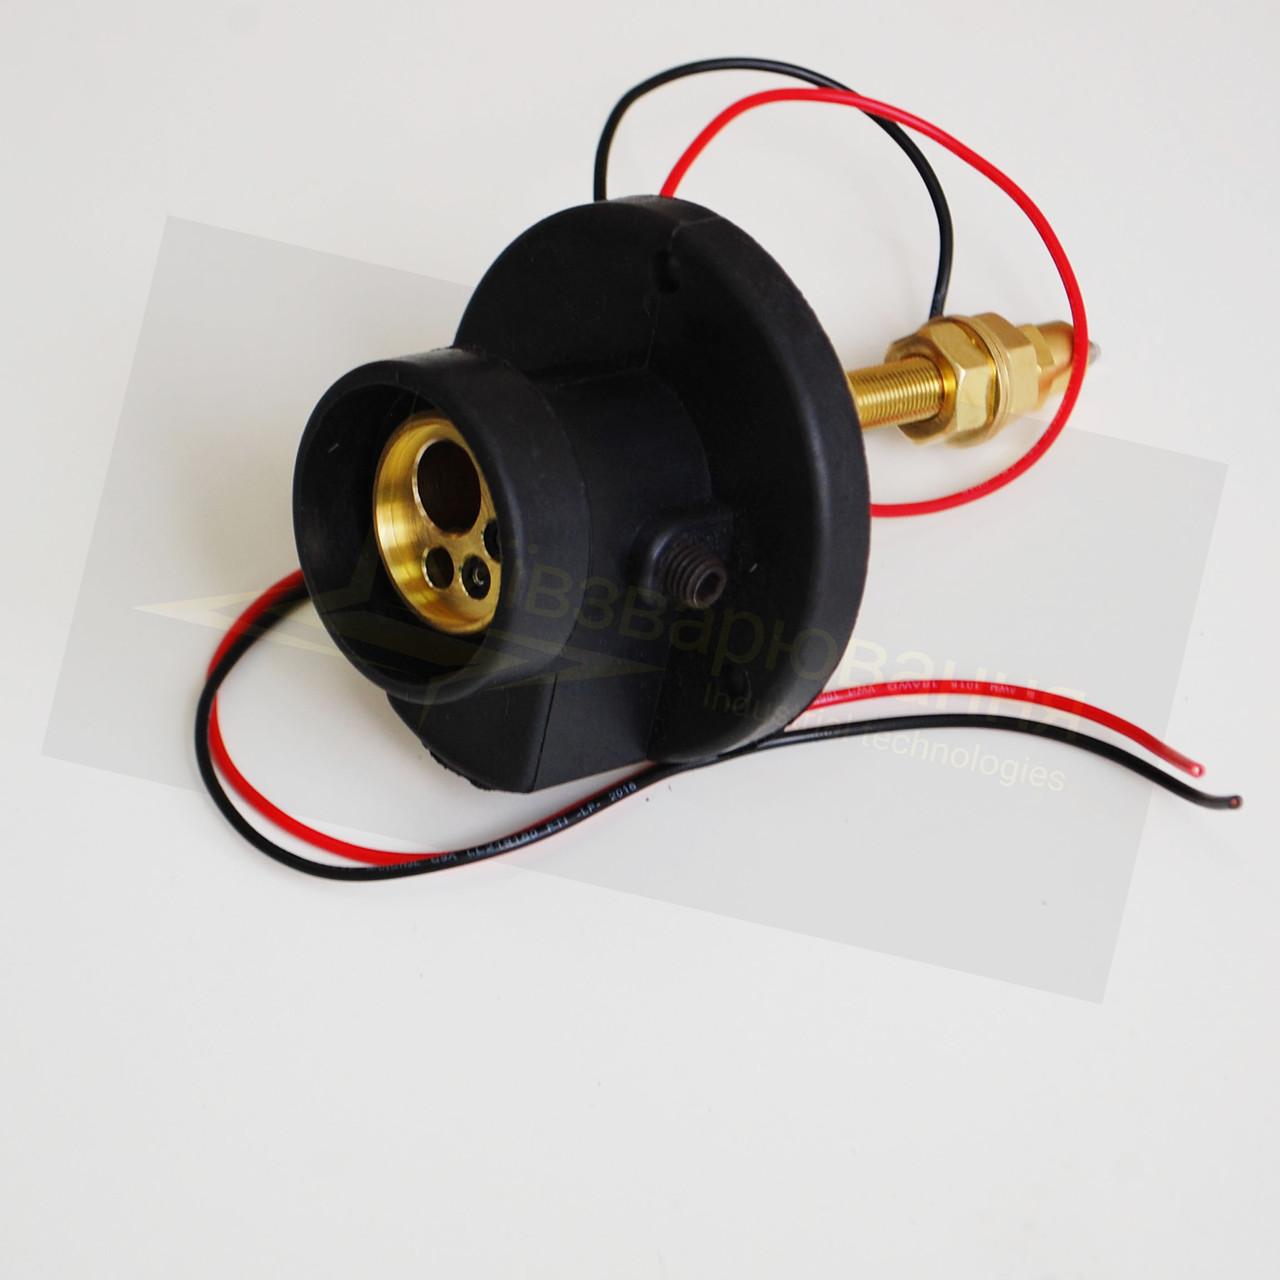 Центральный адаптер KZ-2 гнездо (аппарат)